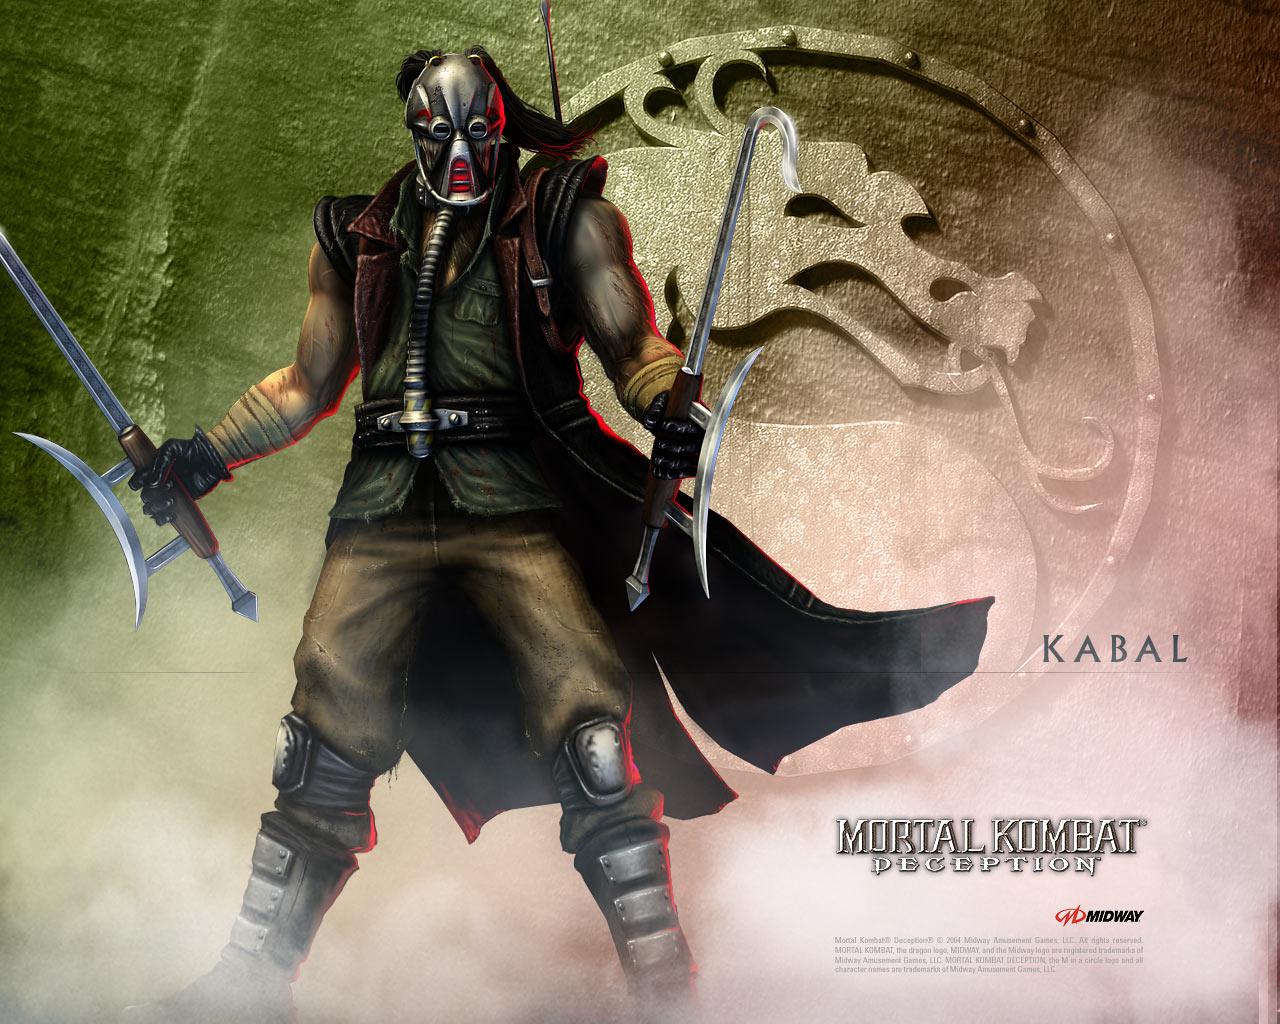 mortal_kombat_deception_kabal_by_prophetoftruth7-d39ih29.jpg